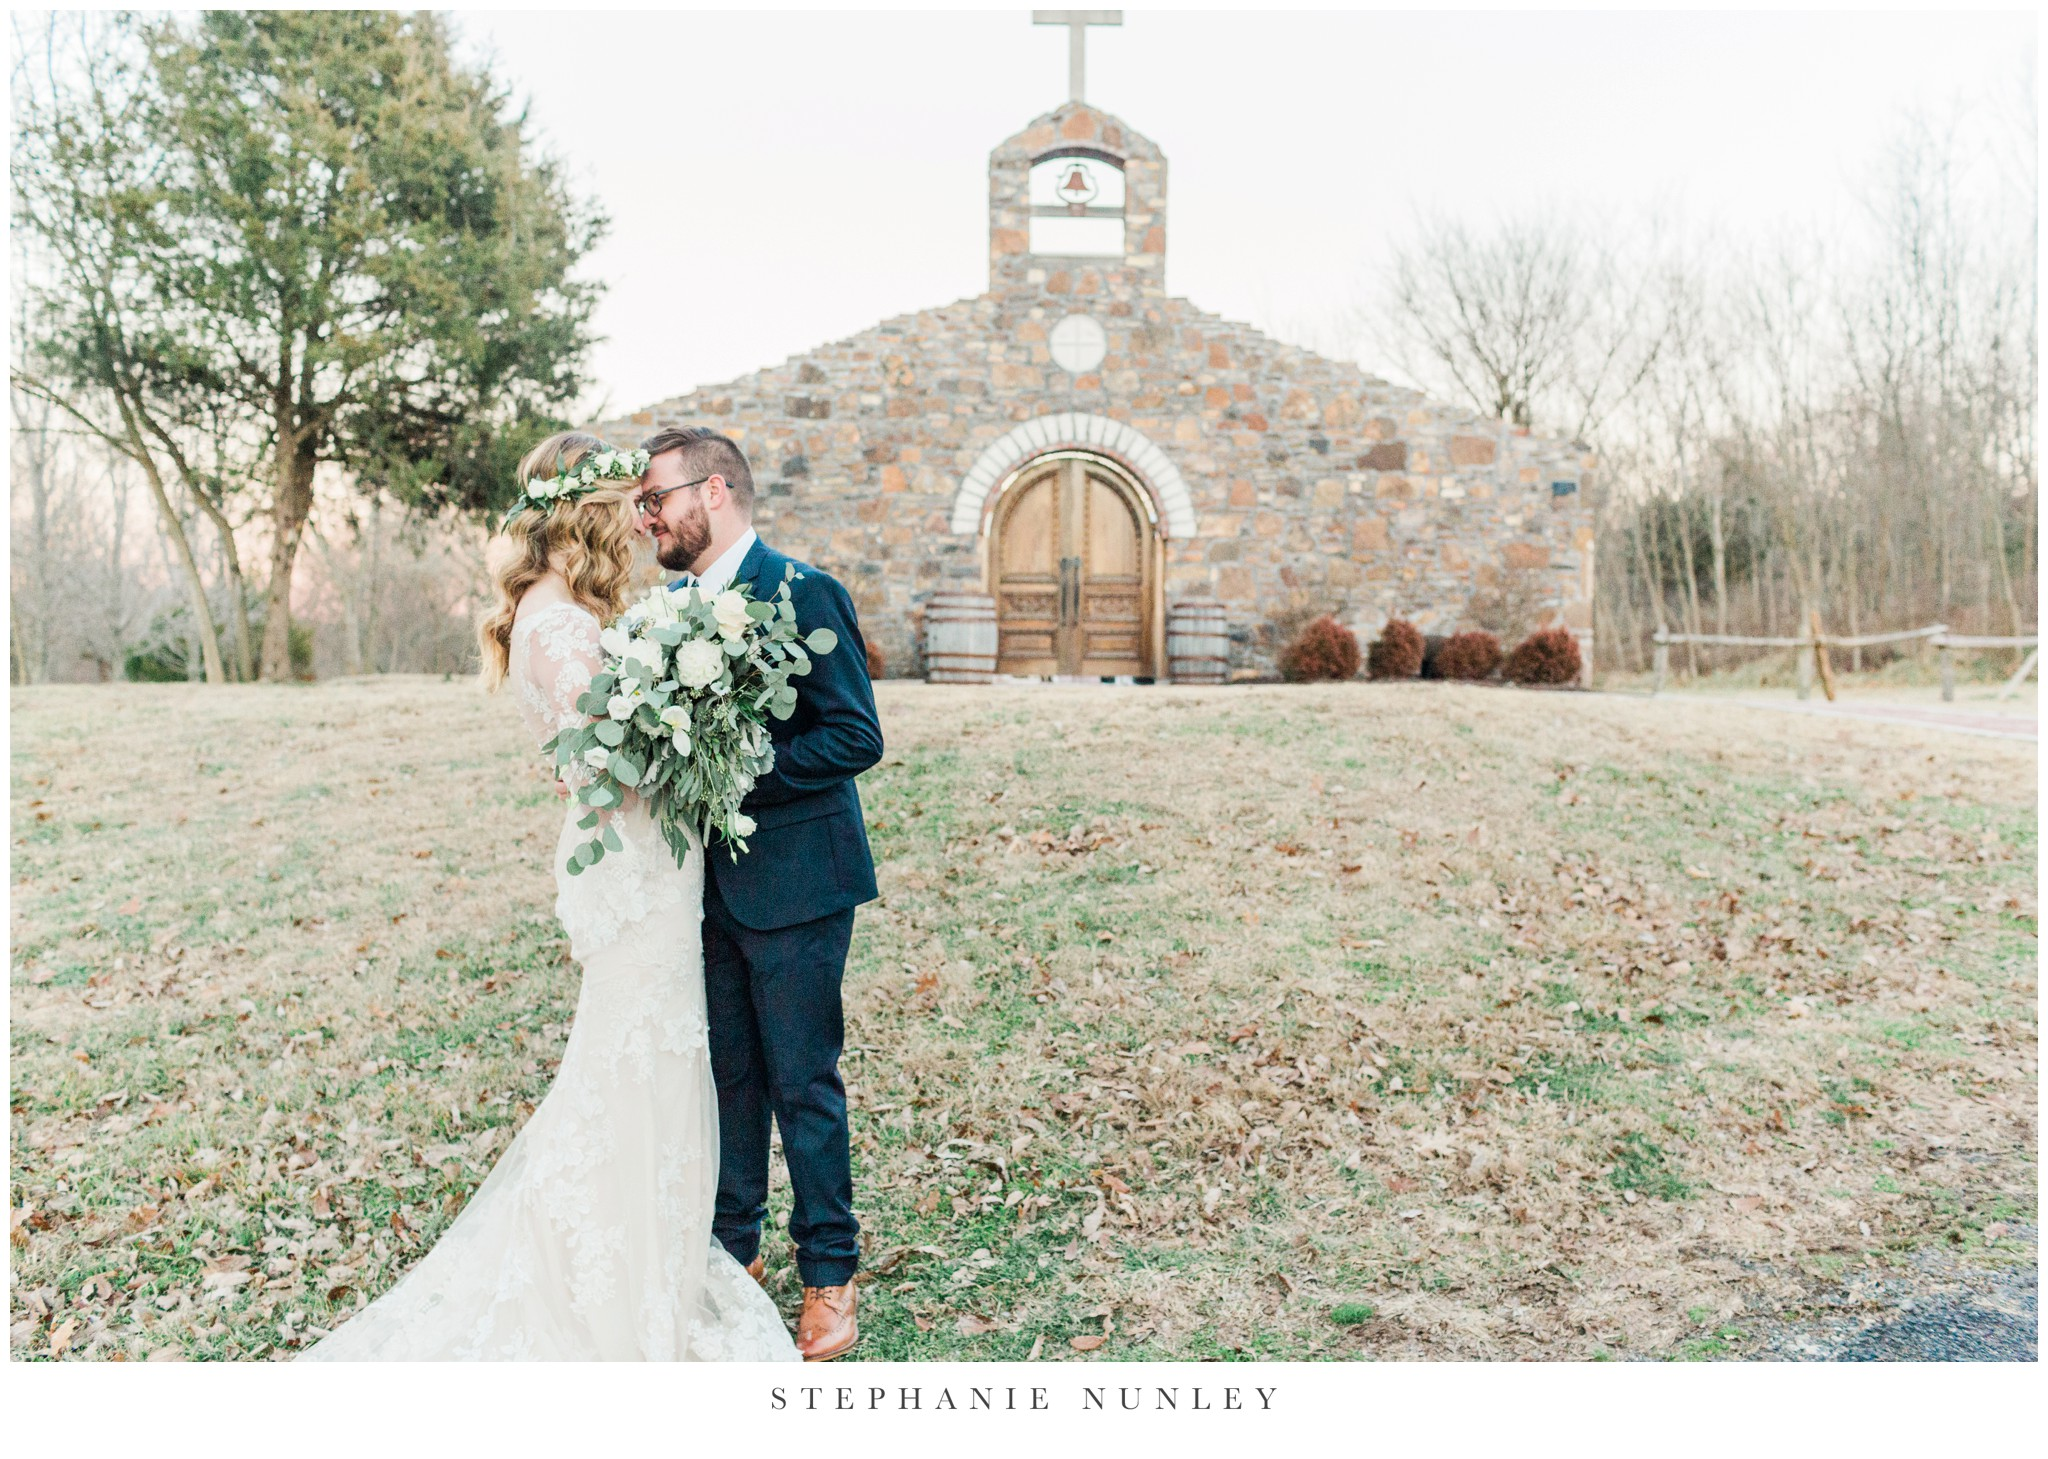 sassafrass-springs-vineyard-film-wedding-photos-64.jpg